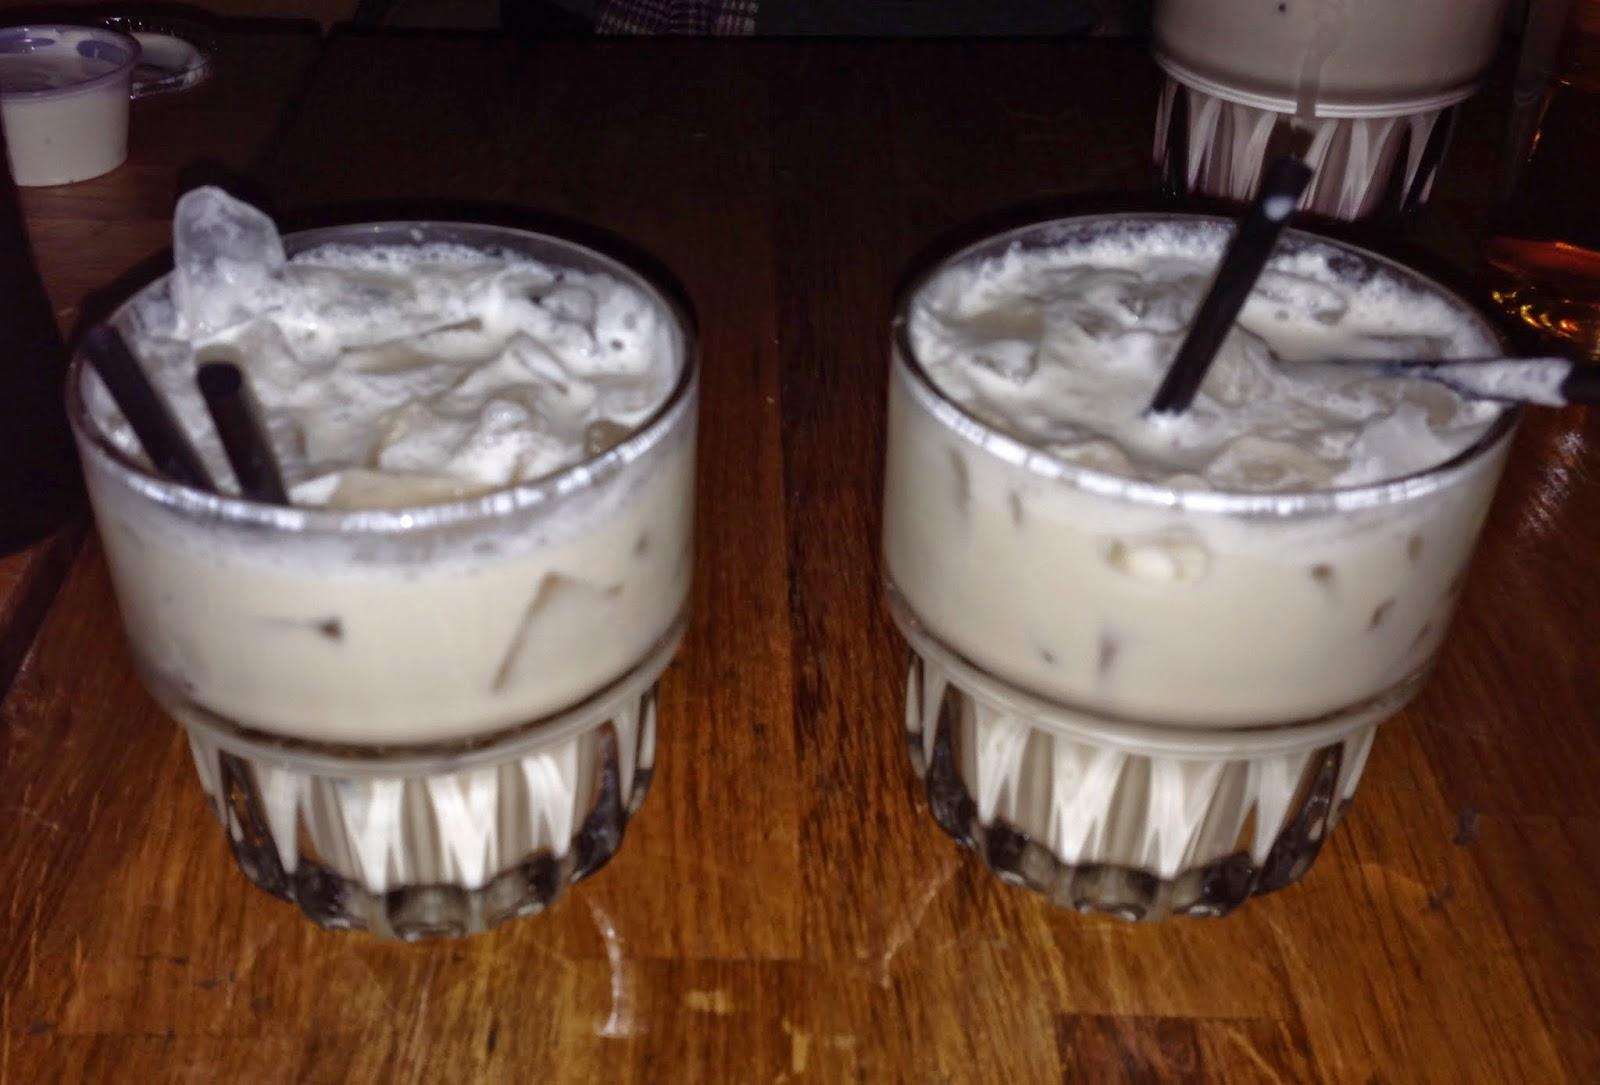 lebowski bar white russians iceland